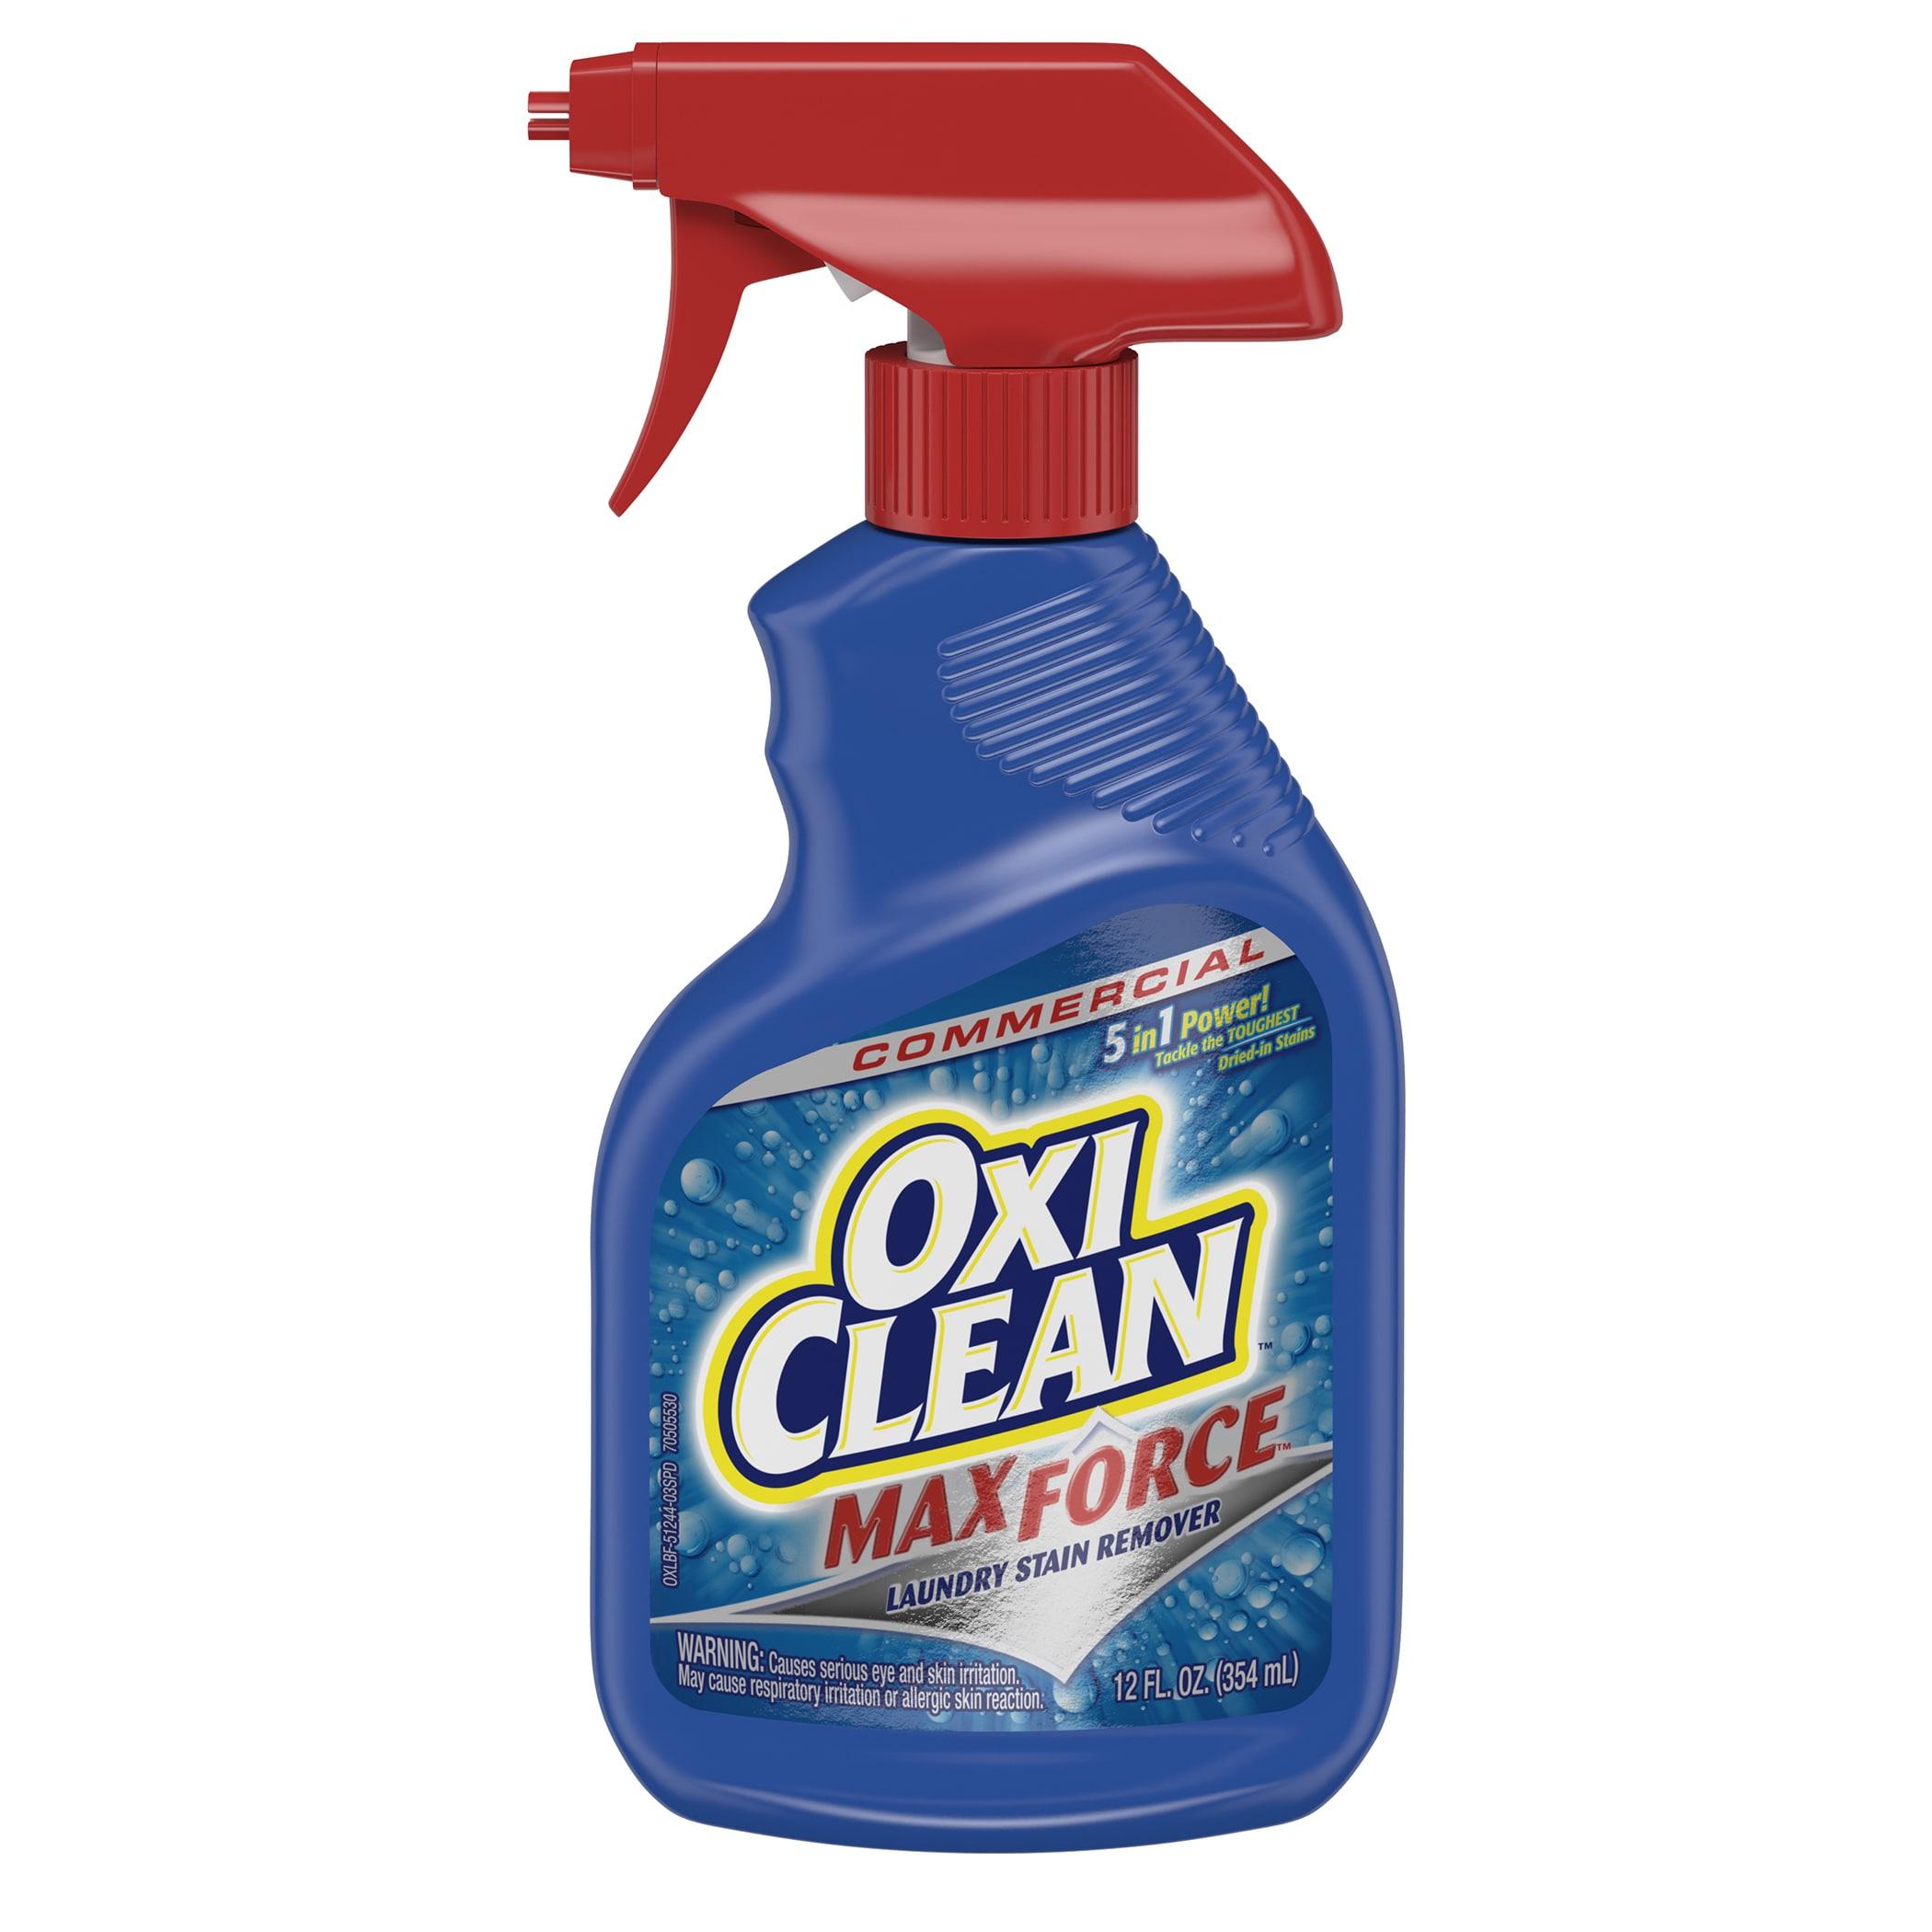 Jensen Oxi Clean 21064-1 12 Oz Max Force Commercial Laund...